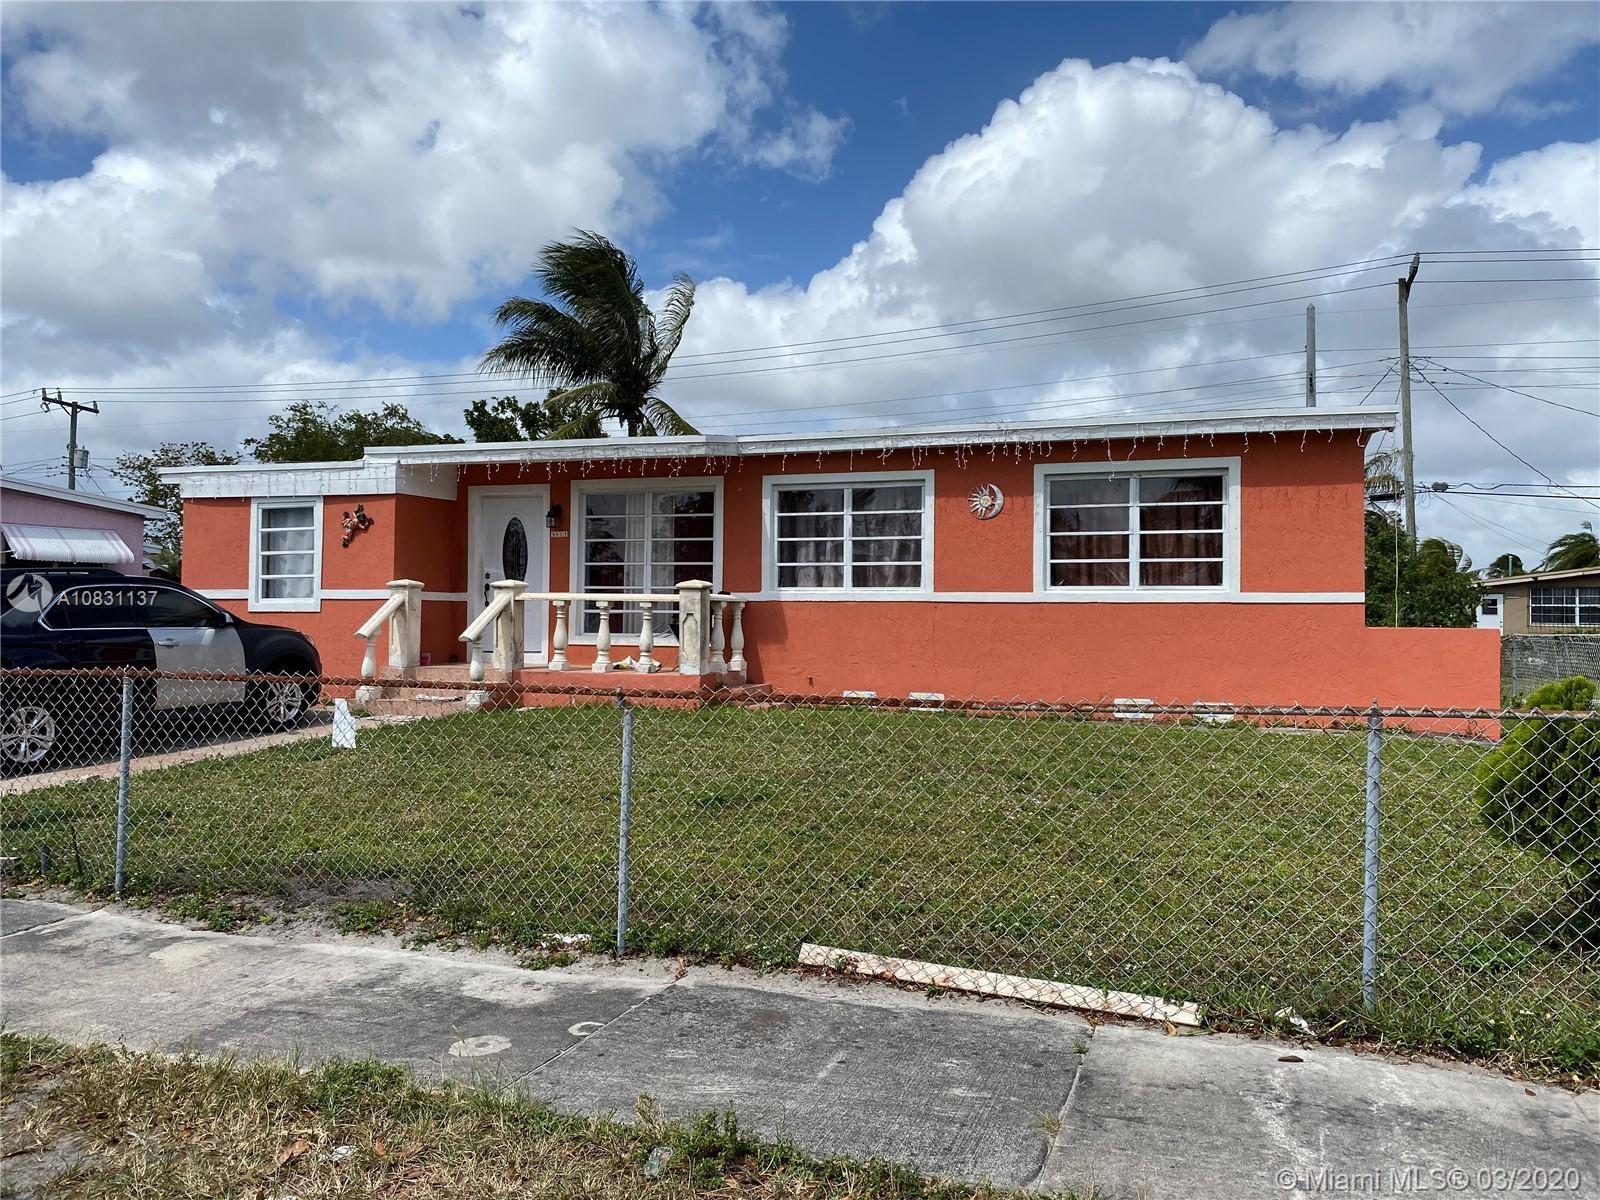 3411 NW 178th St, Miami Gardens, FL 33056 - #: A10831137